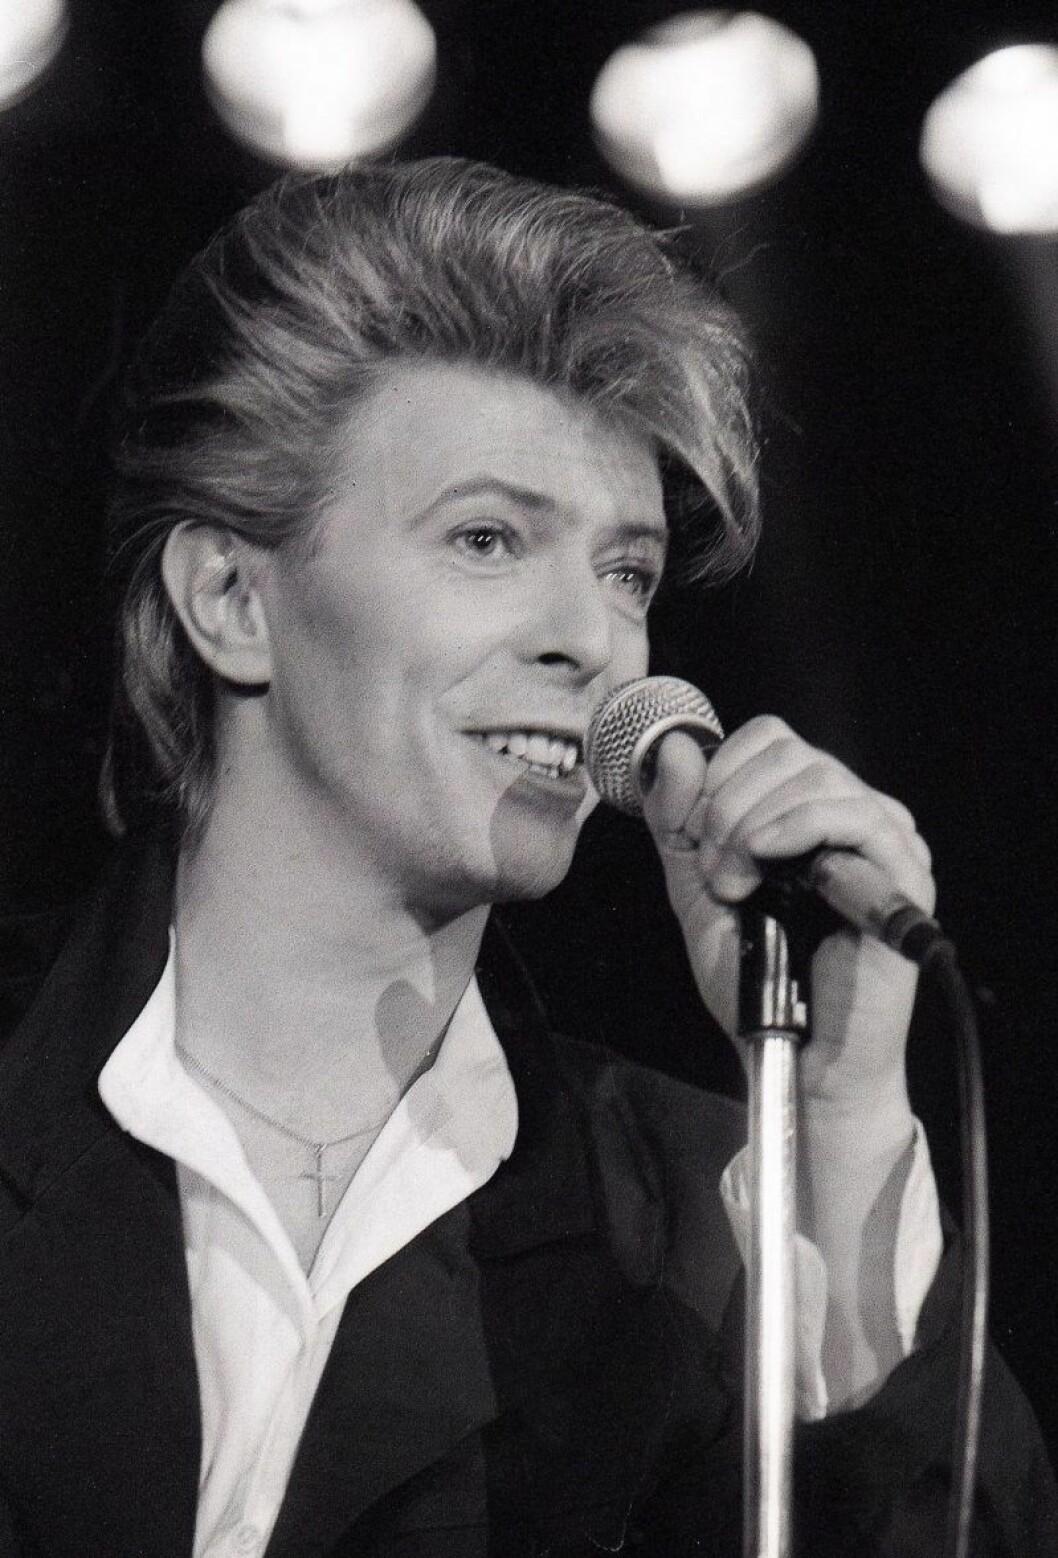 David Bowie 1987